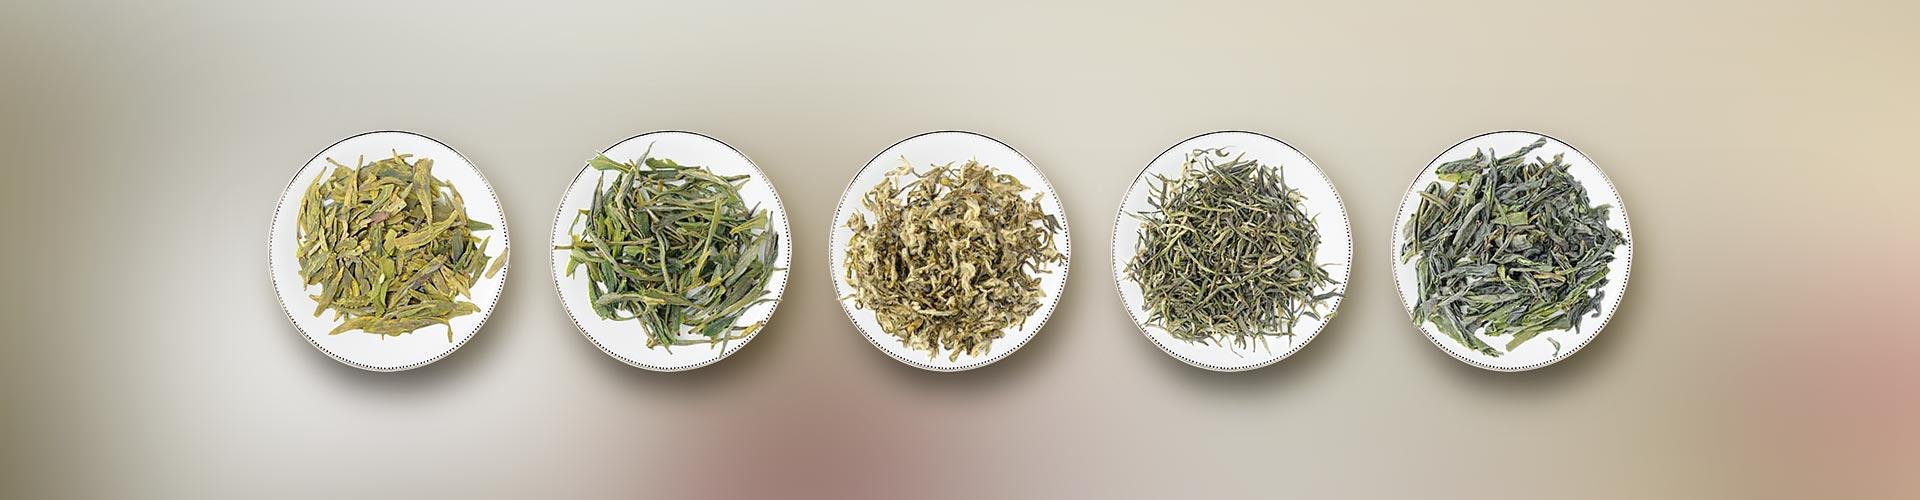 اسامی چای سبز لاهیجان